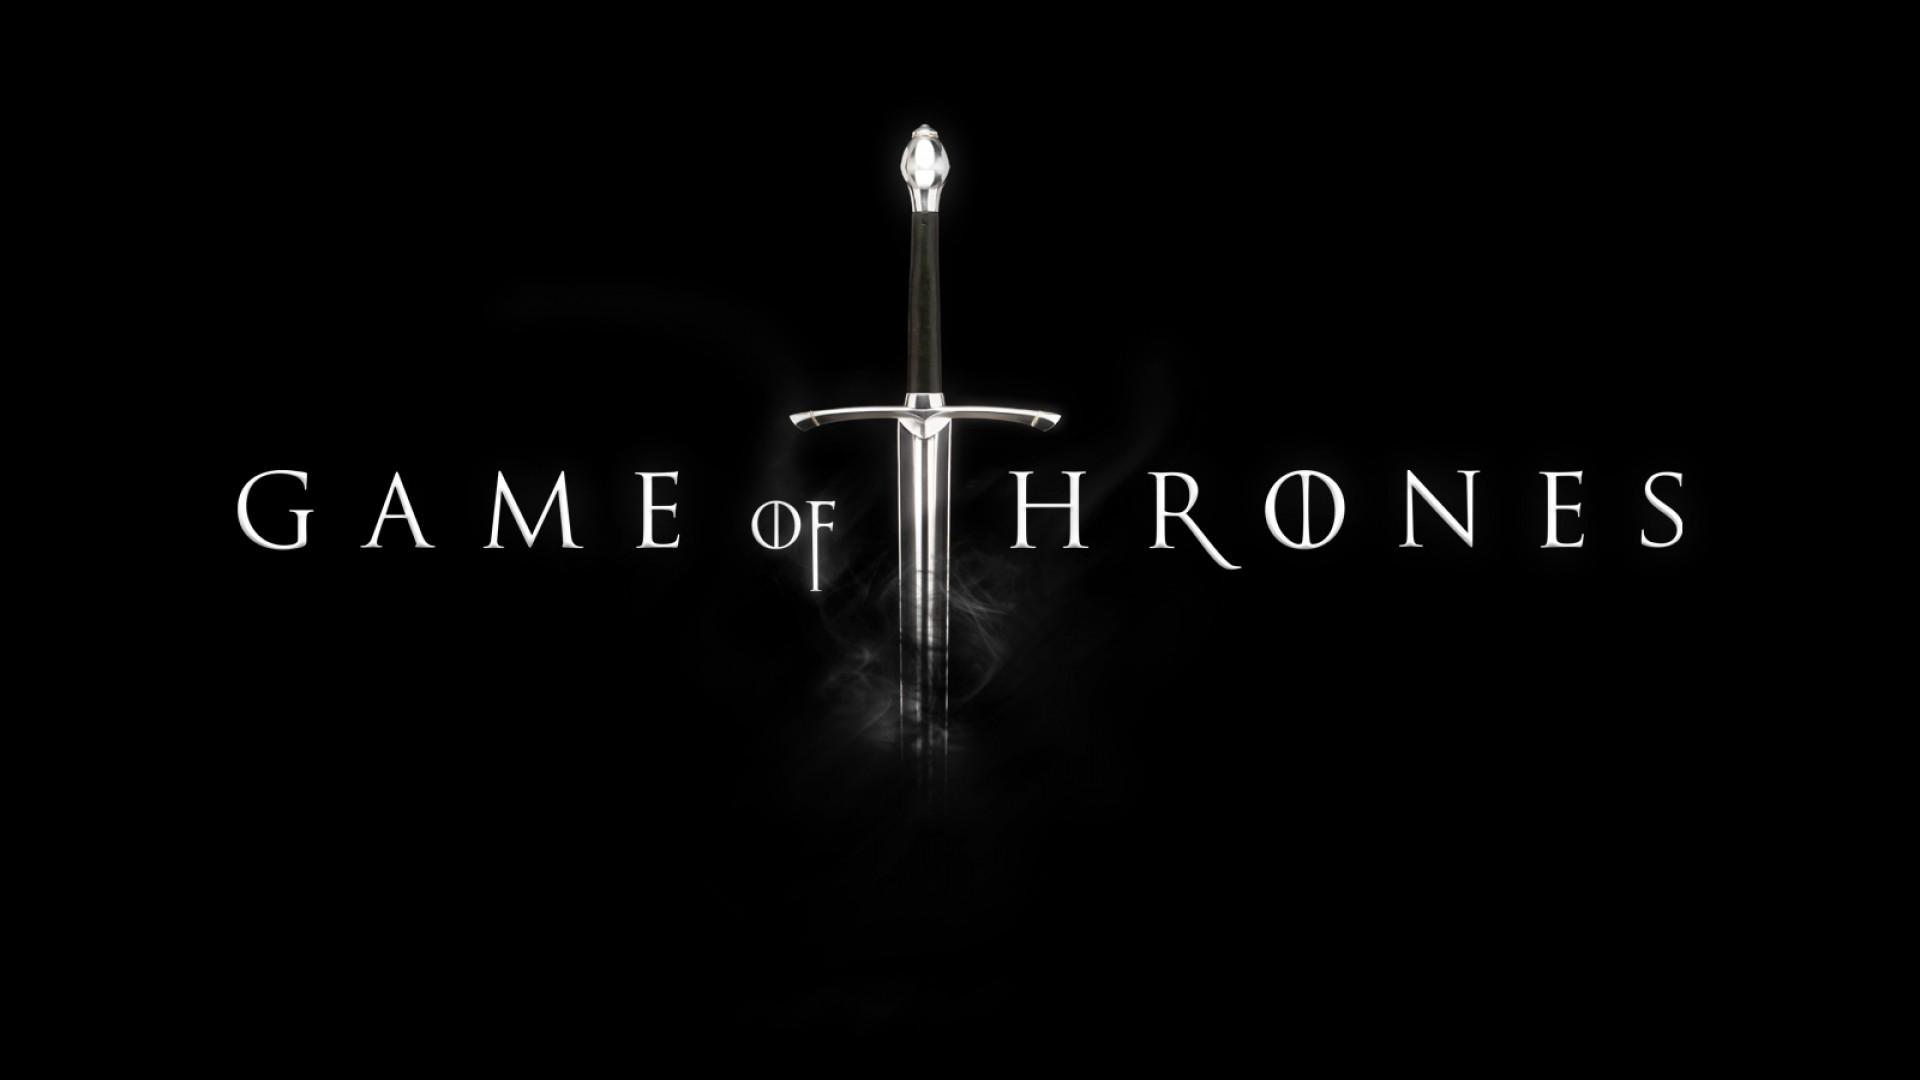 Game Of Thrones Logo Wallpaper 1920x1080 27716